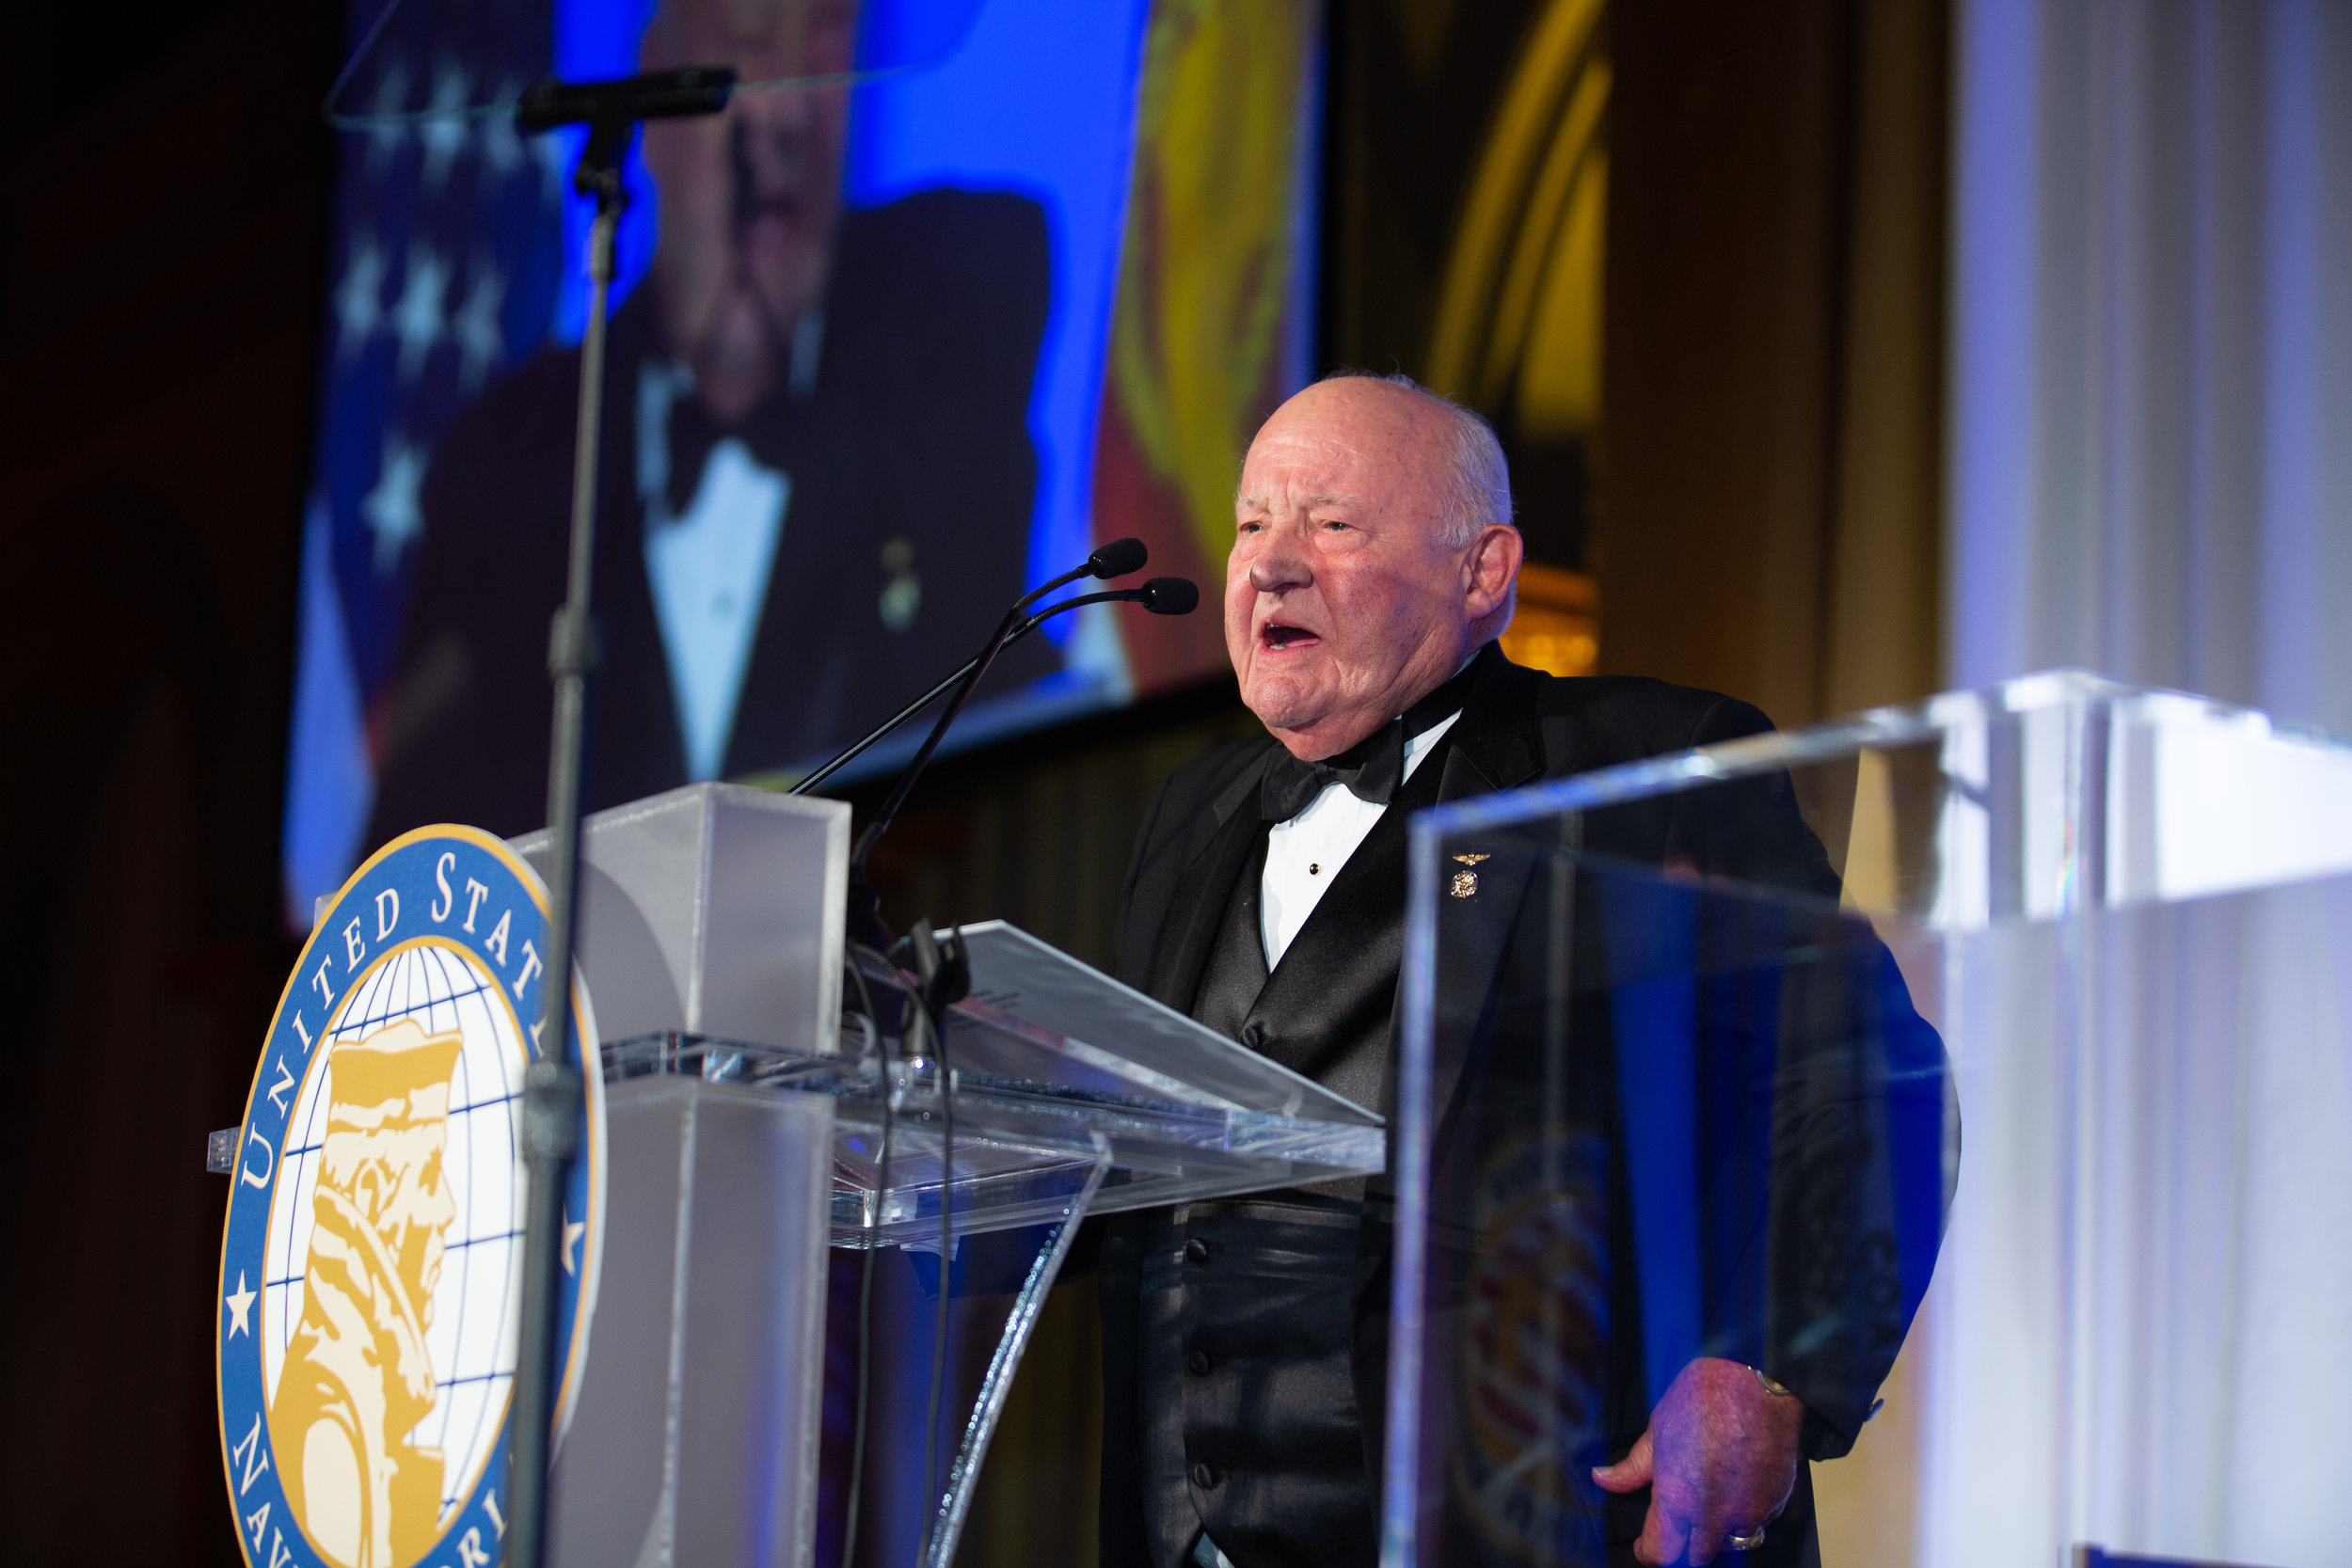 "Dr. J. Phillip (Jack) London introducing Medal of Honor recipient Harvey C. ""Barney"" Barnum Jr. at the 2018 Lone Sailor Awards Dinner in Washington, DC."